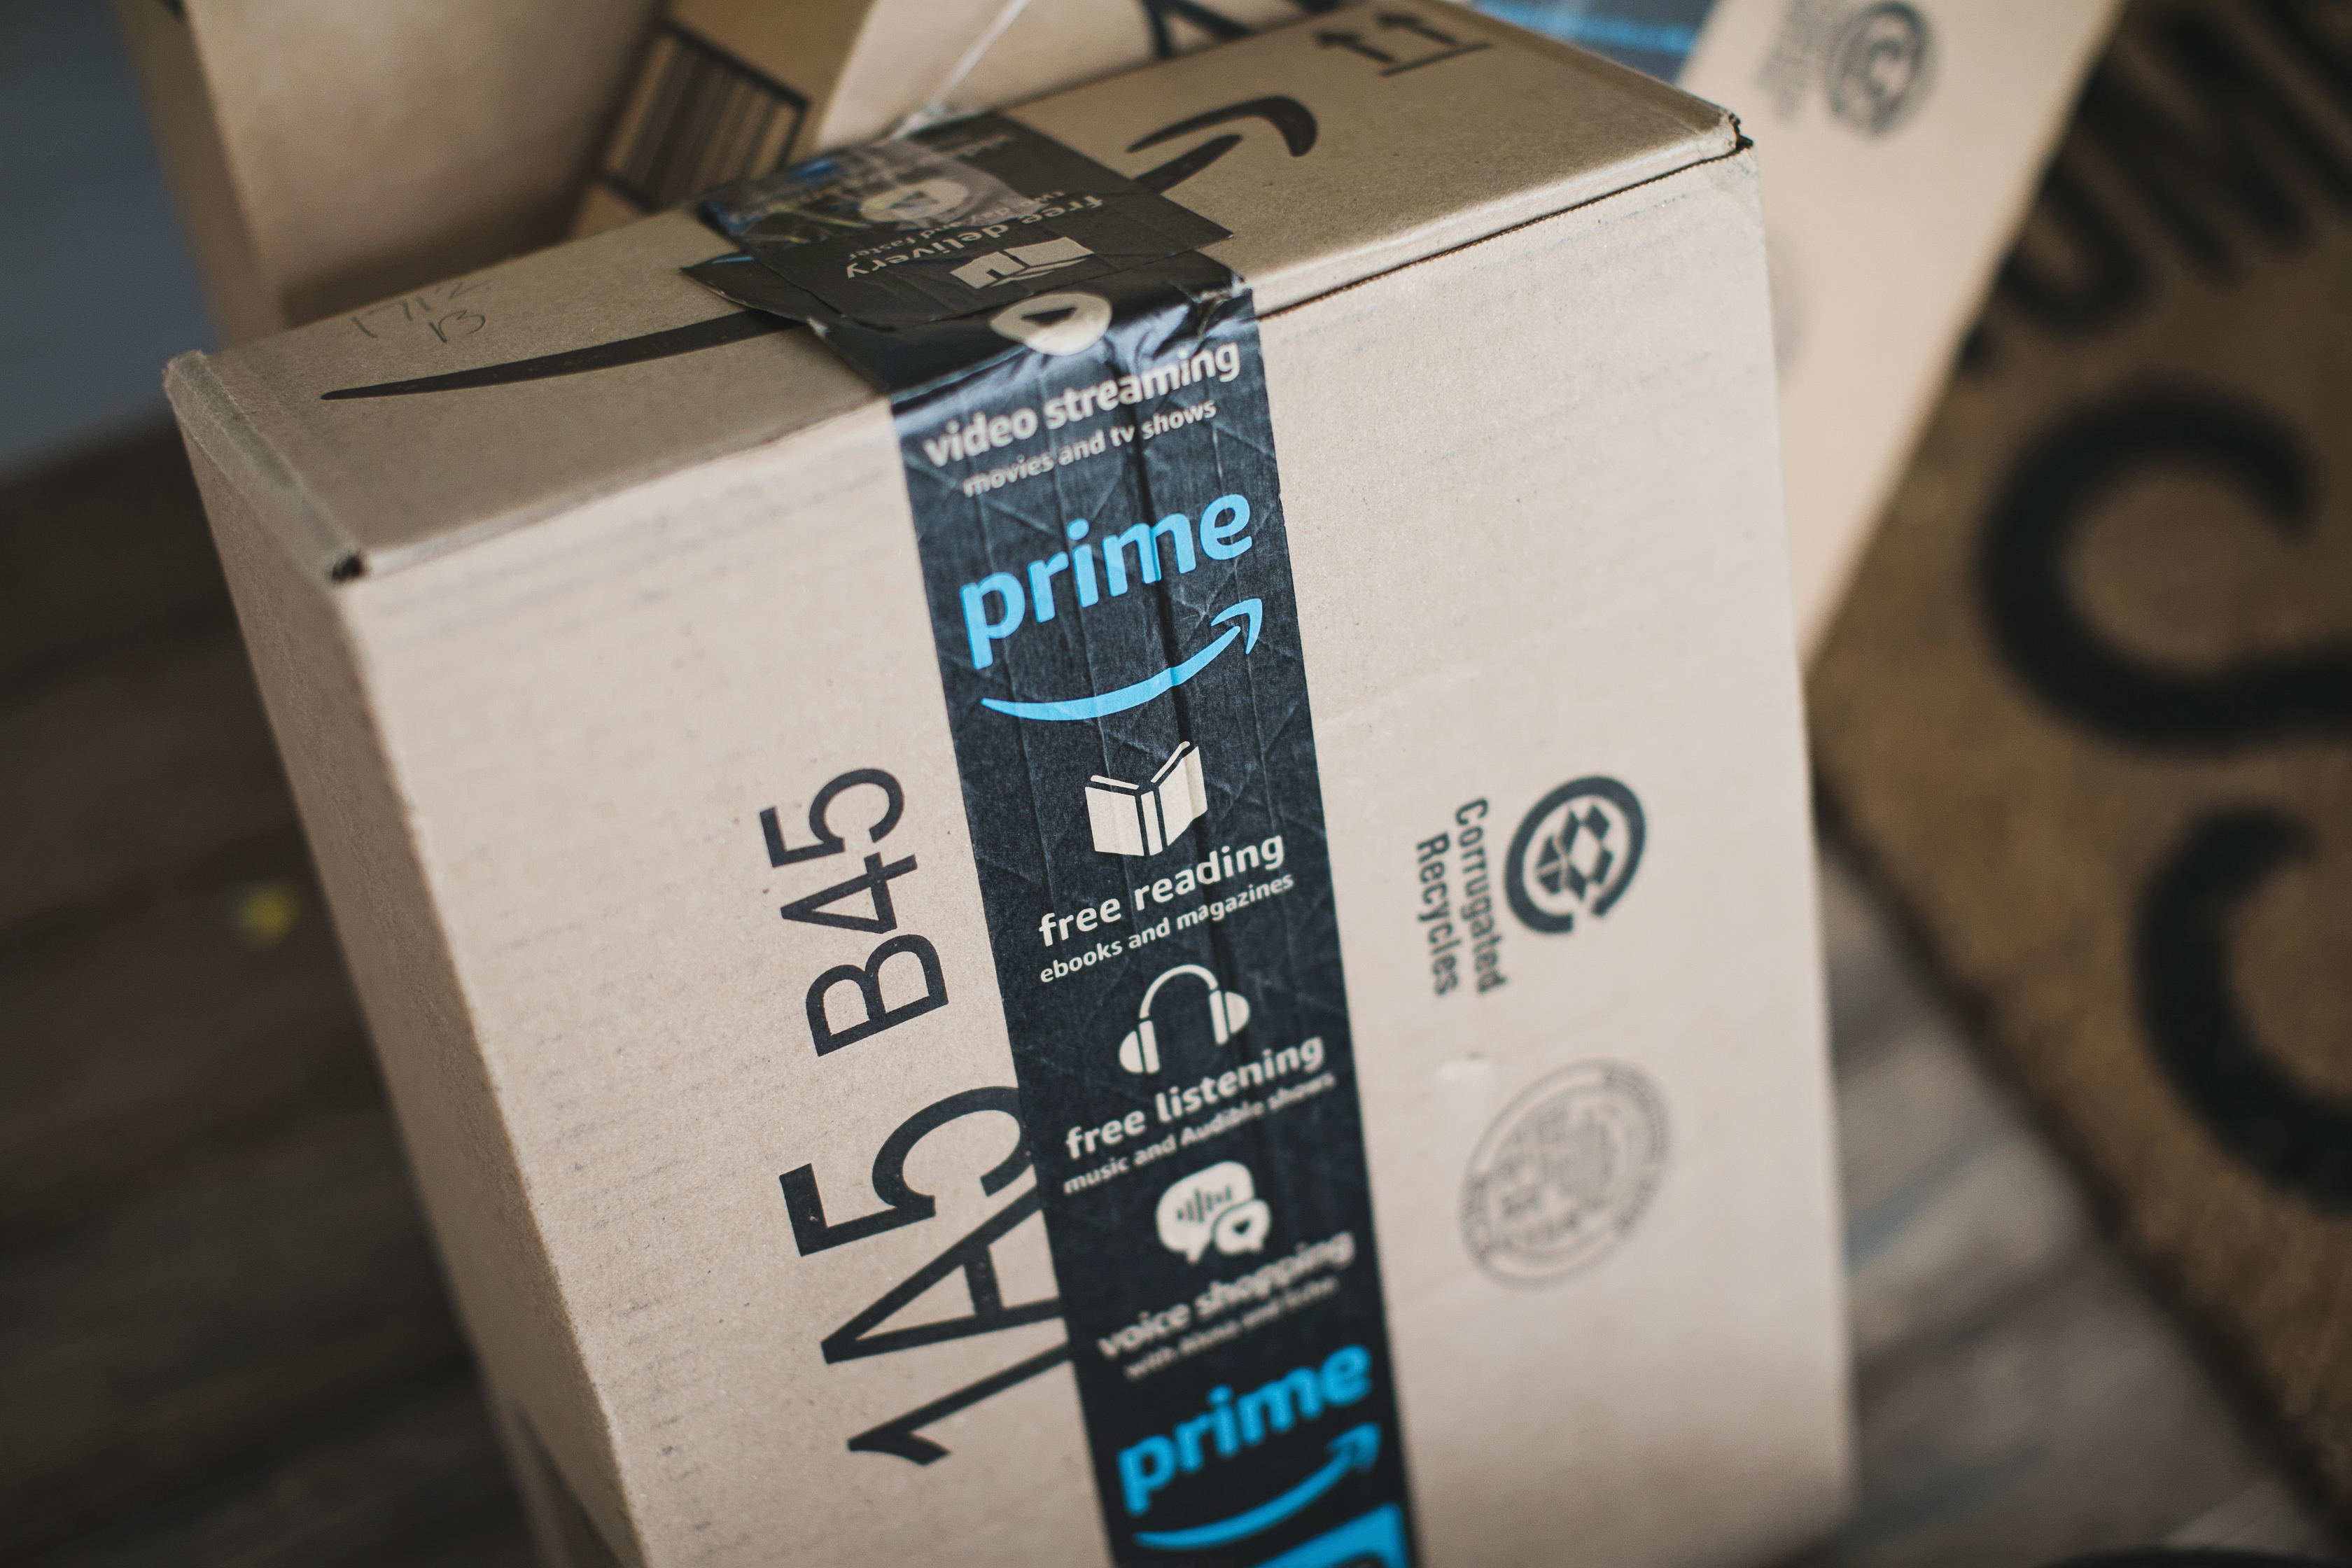 box on porch with Amazon logo